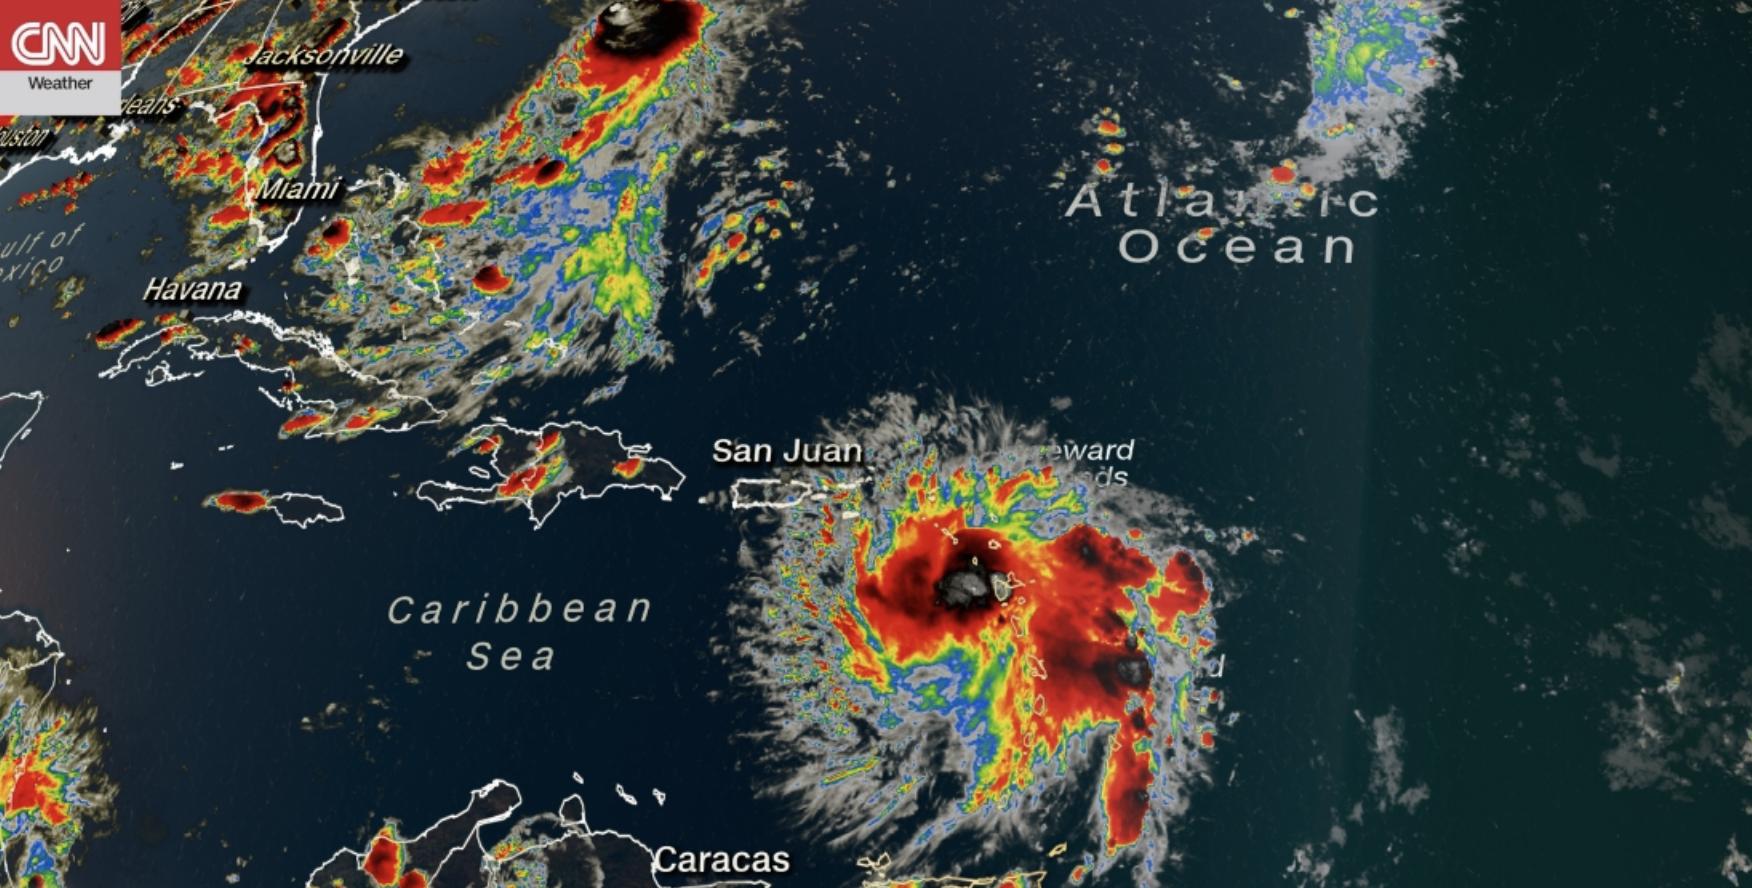 Tuesday coverage of Tropical Storm Dorian - CNN